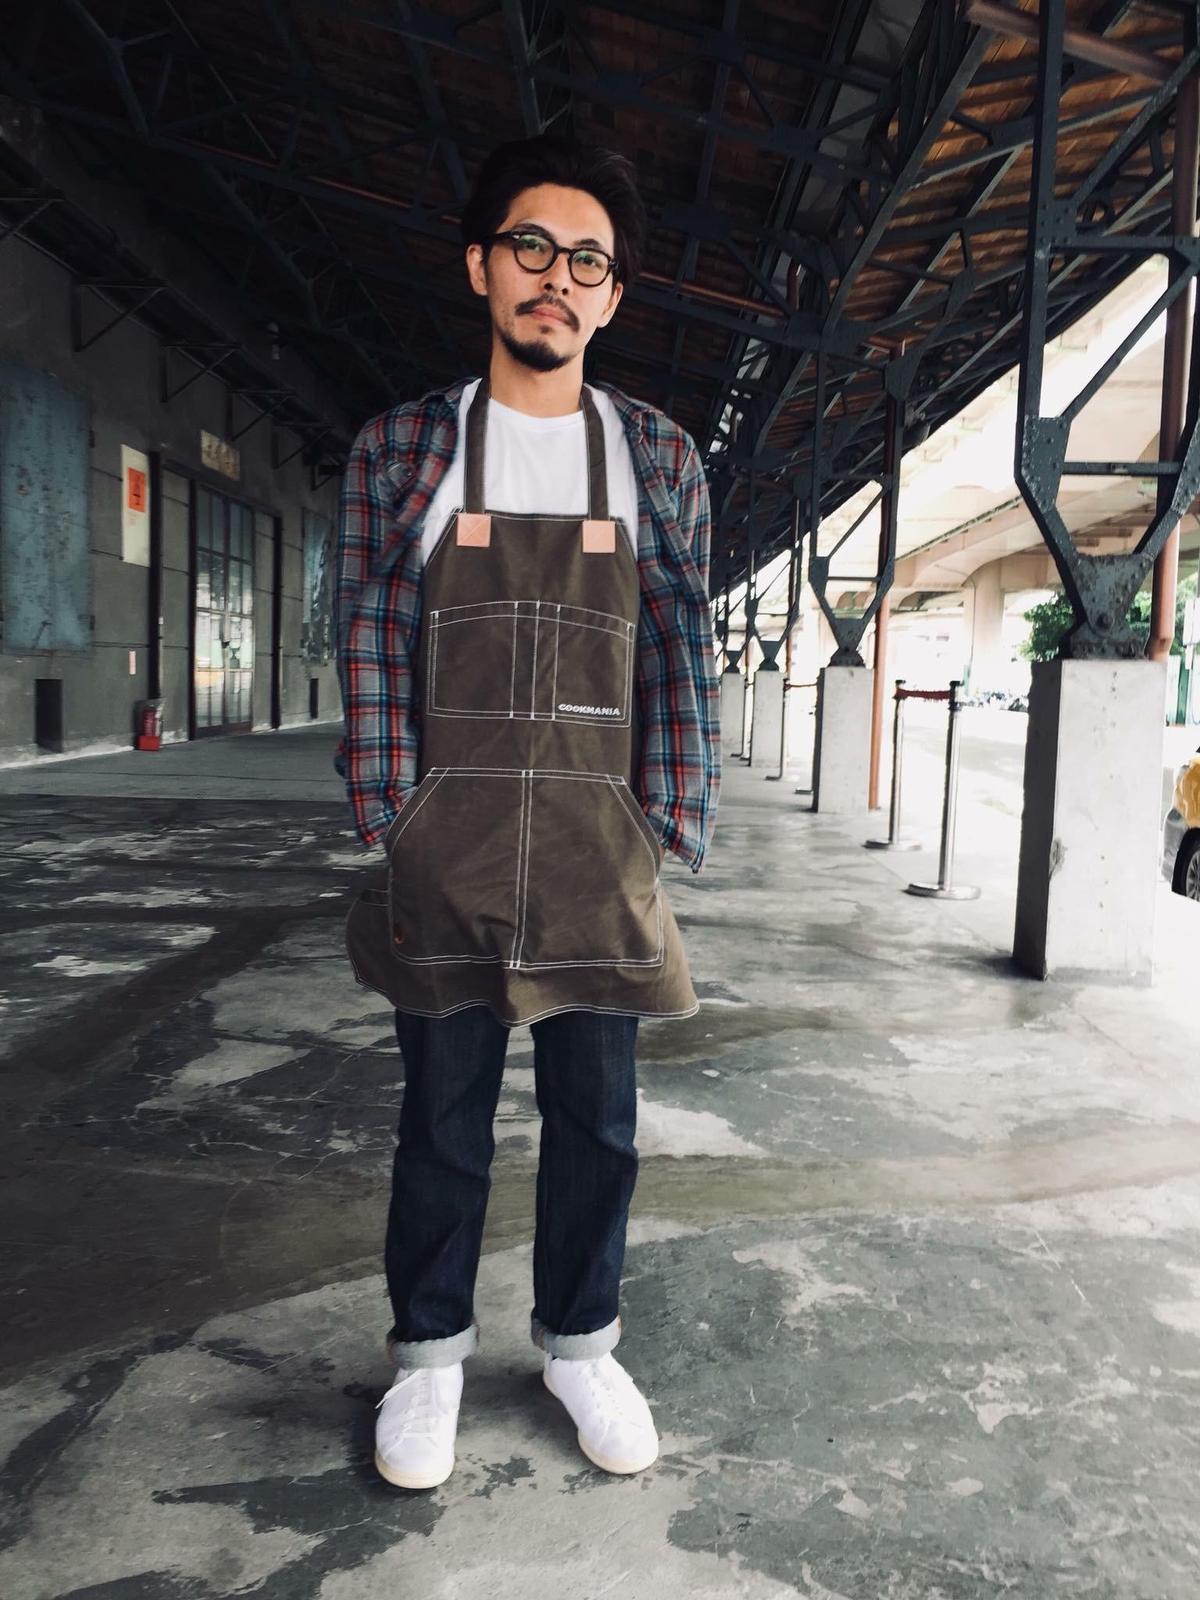 COOKMANIA發起人郭庭瑋(Wes)自己也是廚師,他這幾年深入食材原鄉,並串連餐飲界跨界合作。(COOKMANIA提供)